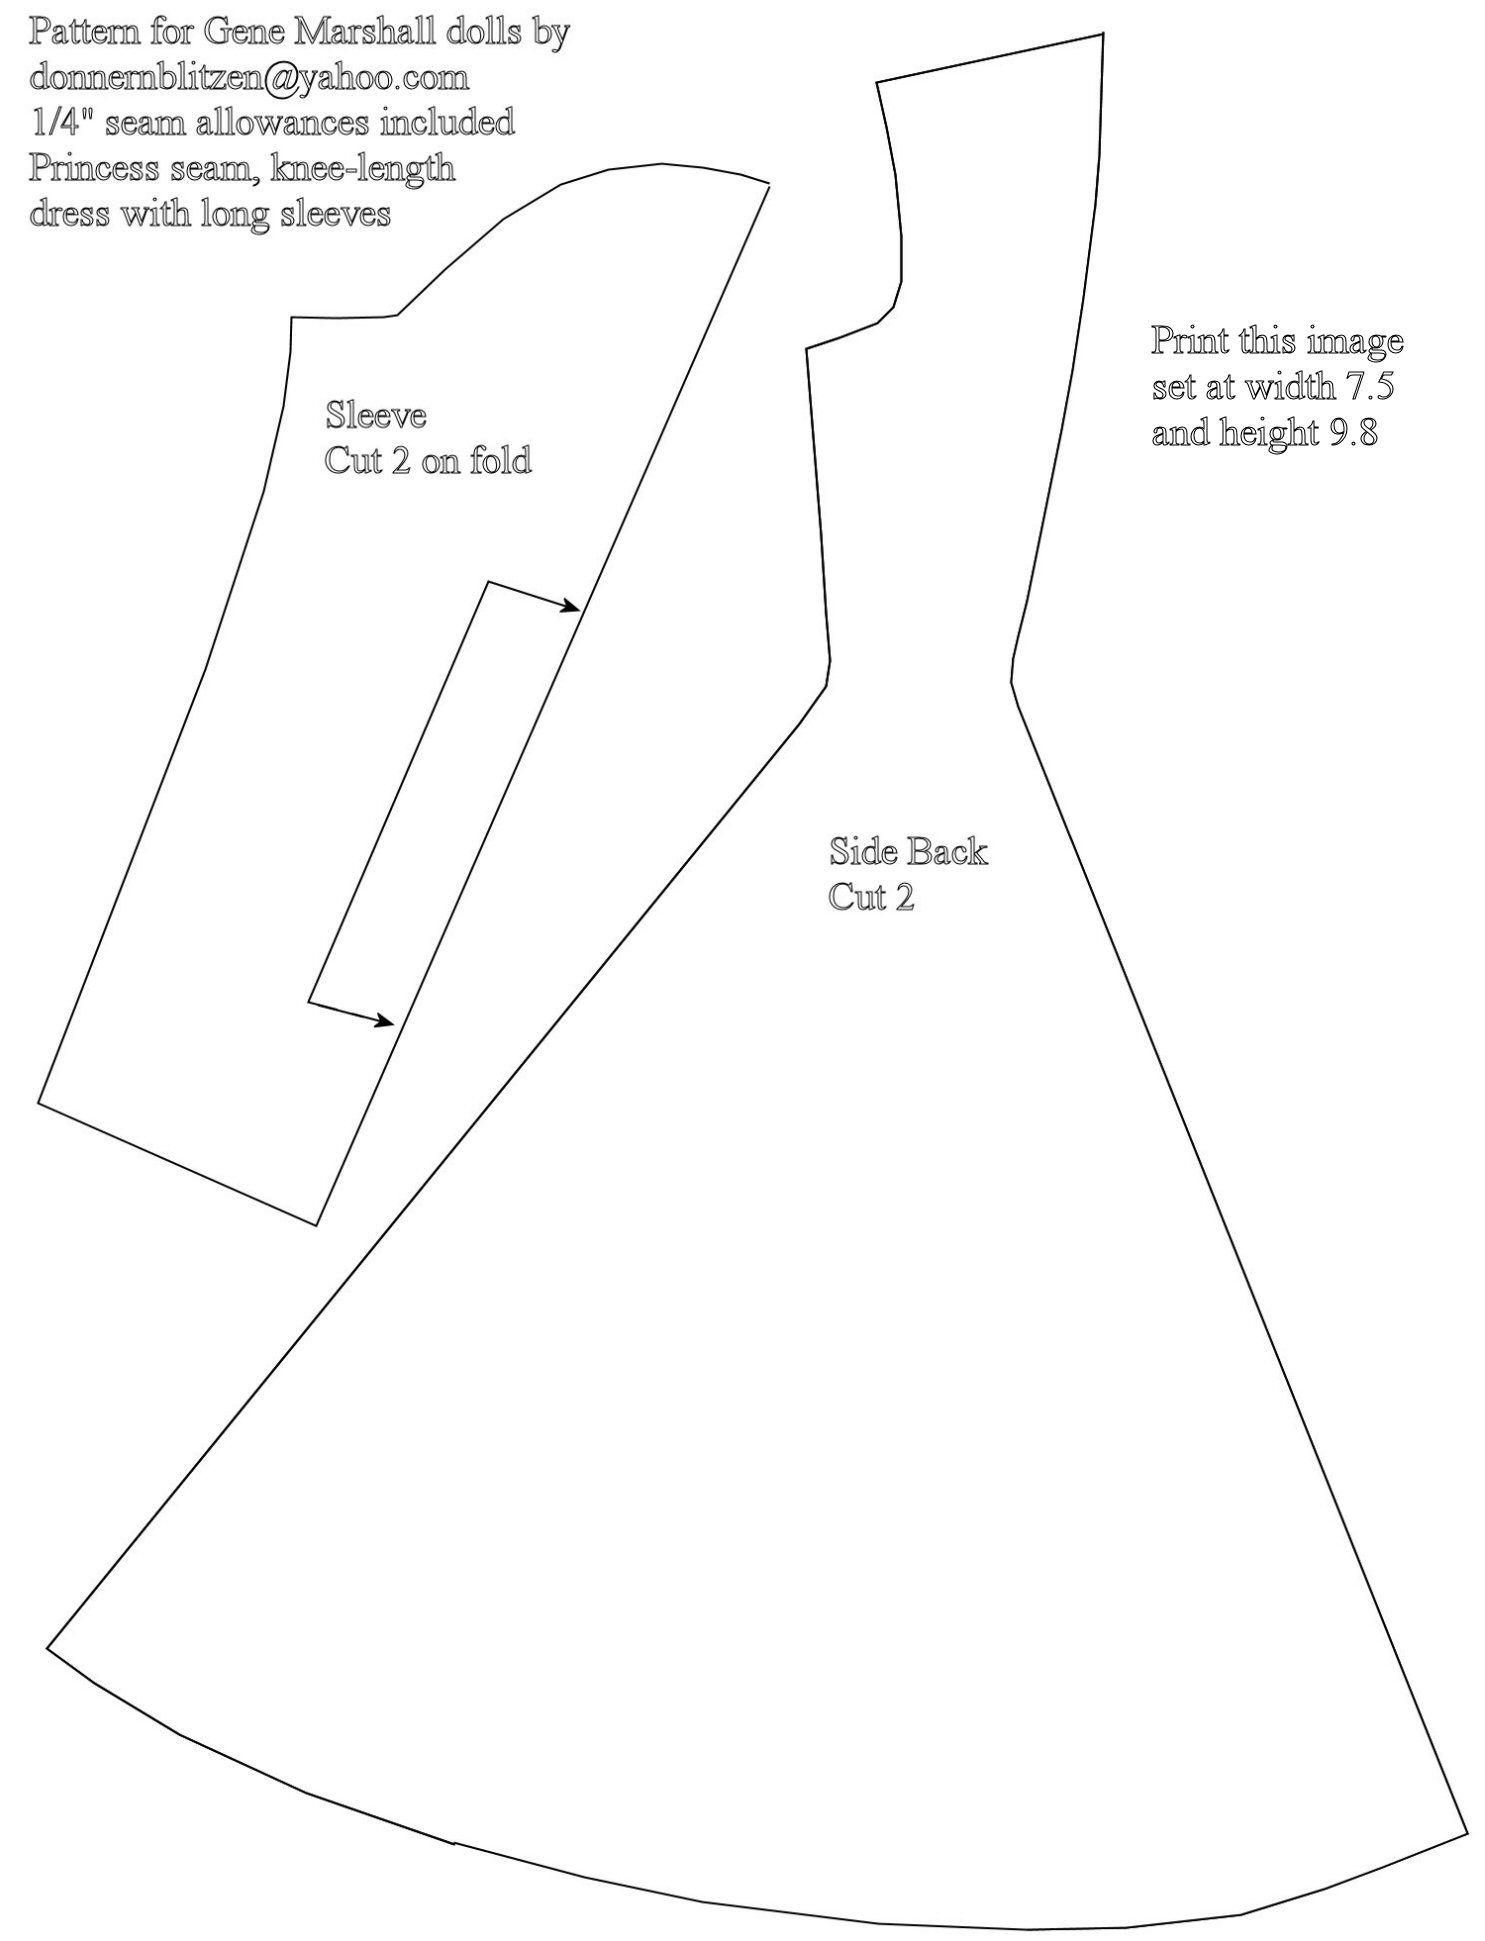 Free Printable Barbie Doll Cloths Patterns | Barbie | Barbie Clothes - Barbie Dress Patterns Free Printable Pdf